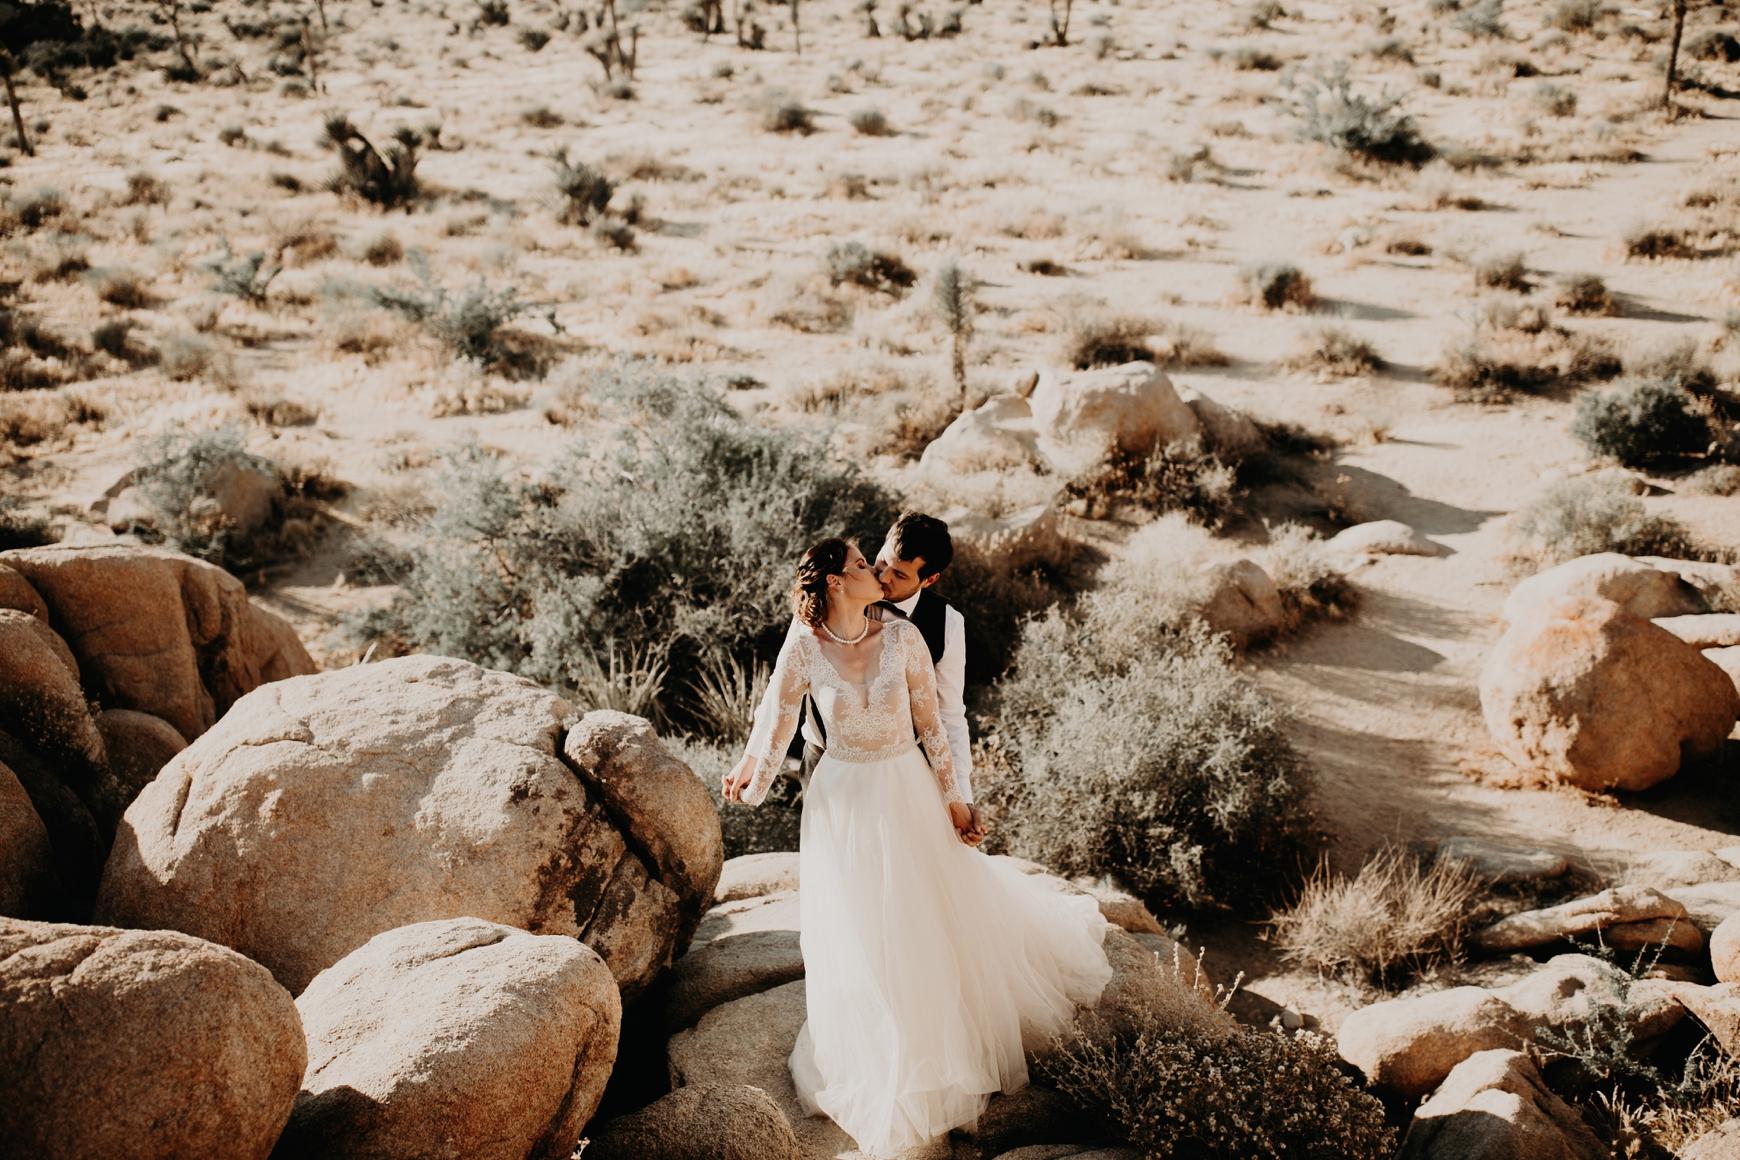 Joshua Tree Bridal Portraits Anastasia & Andrey Emily Magers Photography-36.jpg